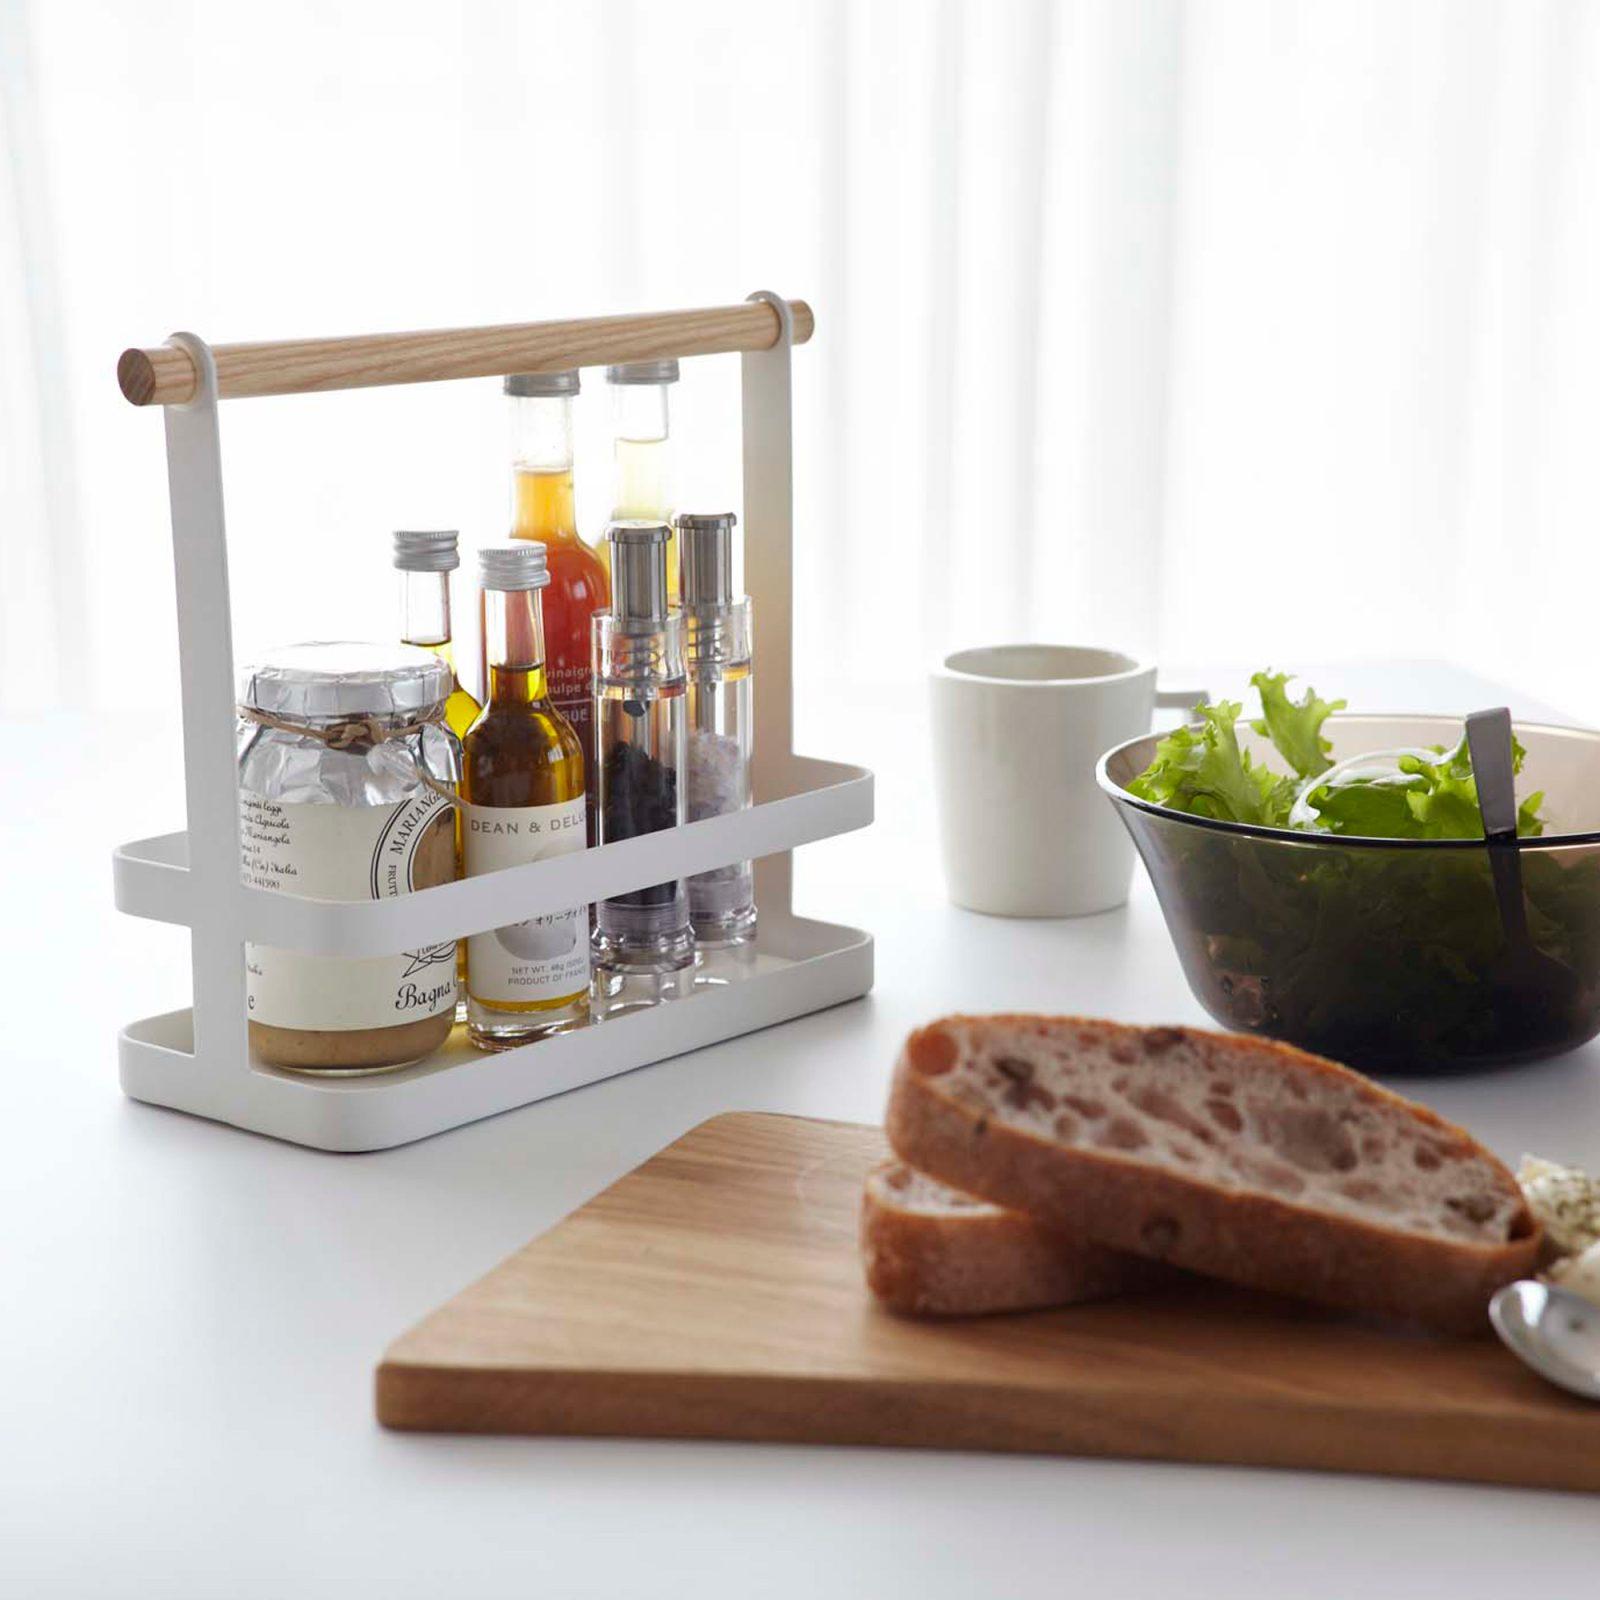 tosca-tabletop-spice-rack-white-3